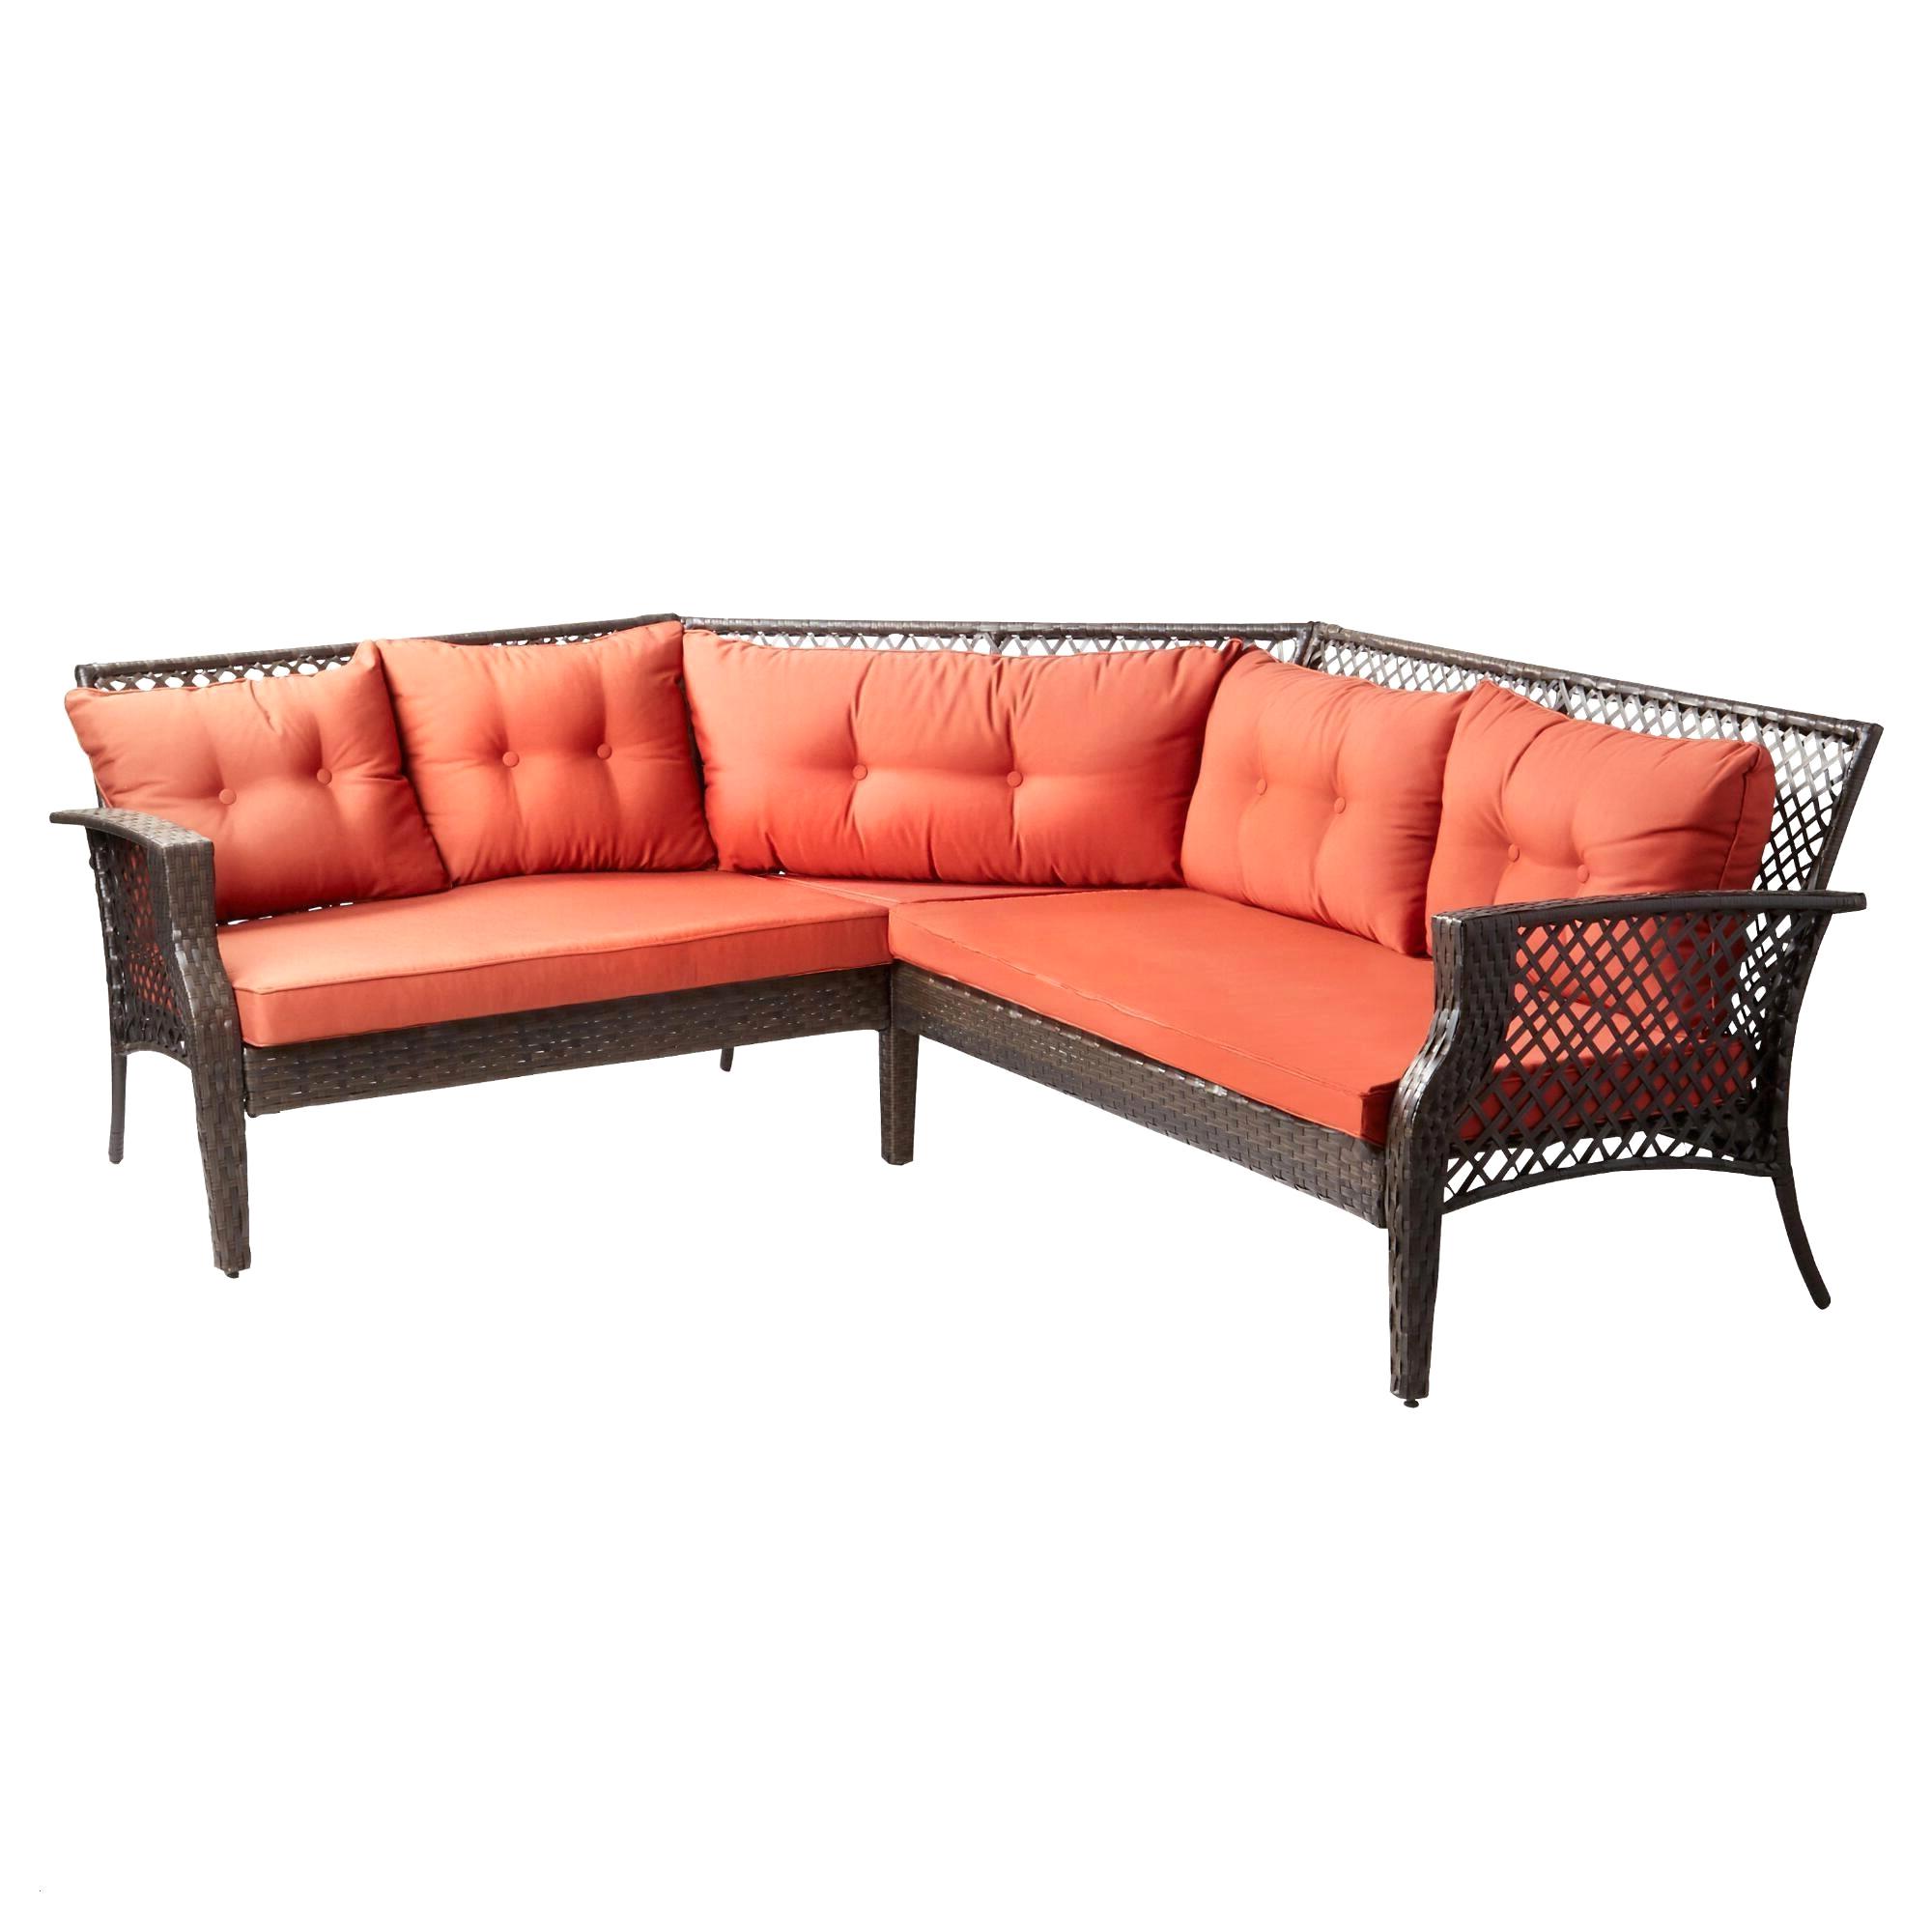 outdoor patio swings inspirational couchgarnitur das beste von big sofa patio sofa elegant wicker